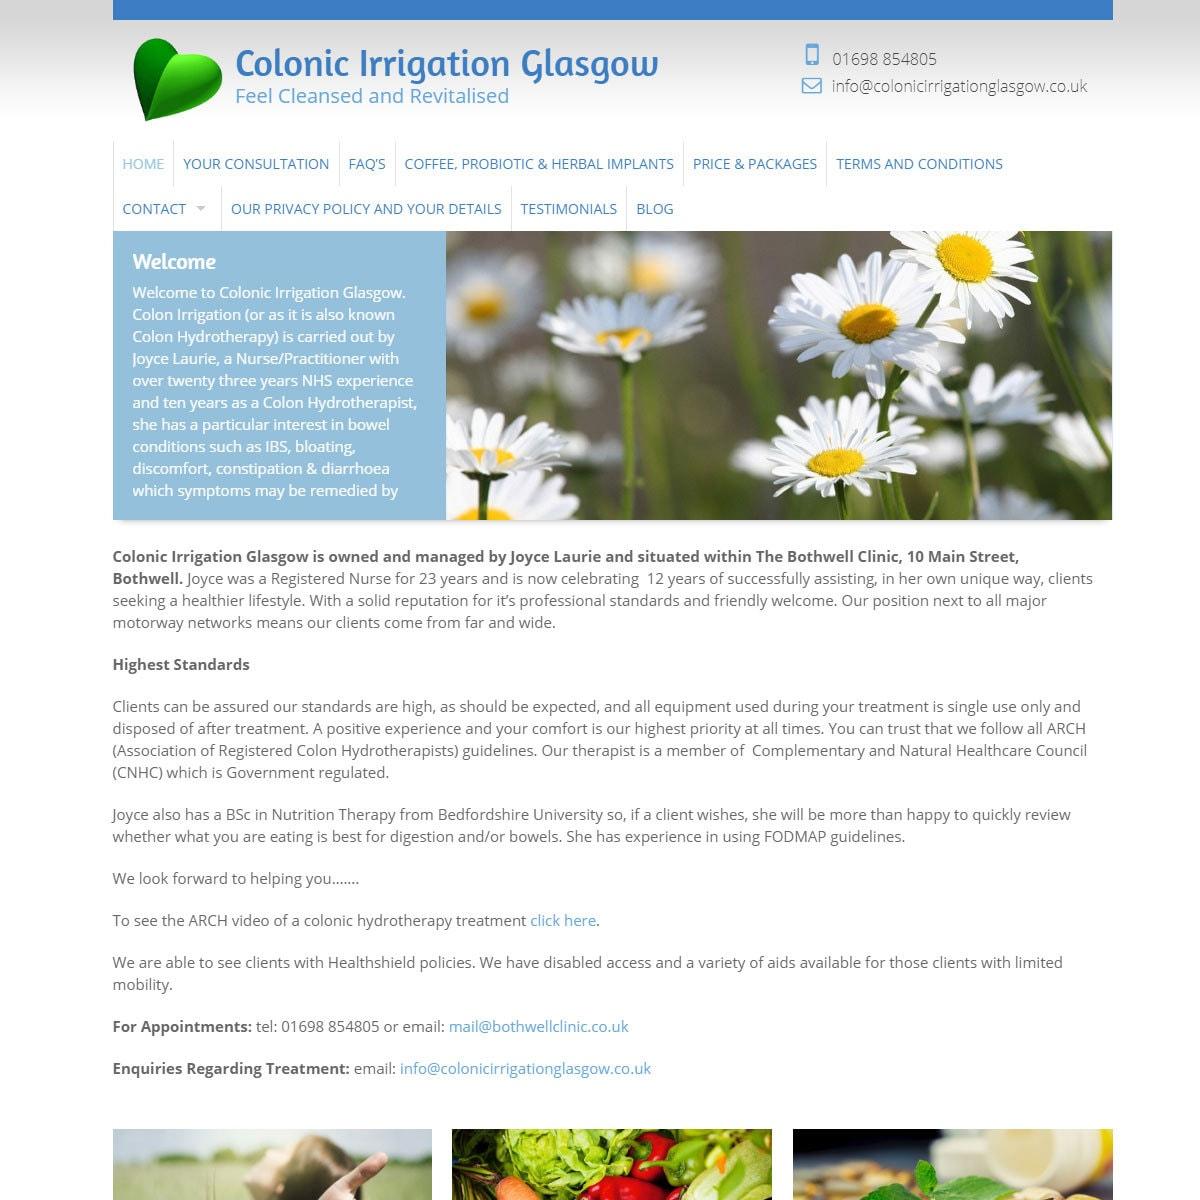 colonicirrigationglasgow